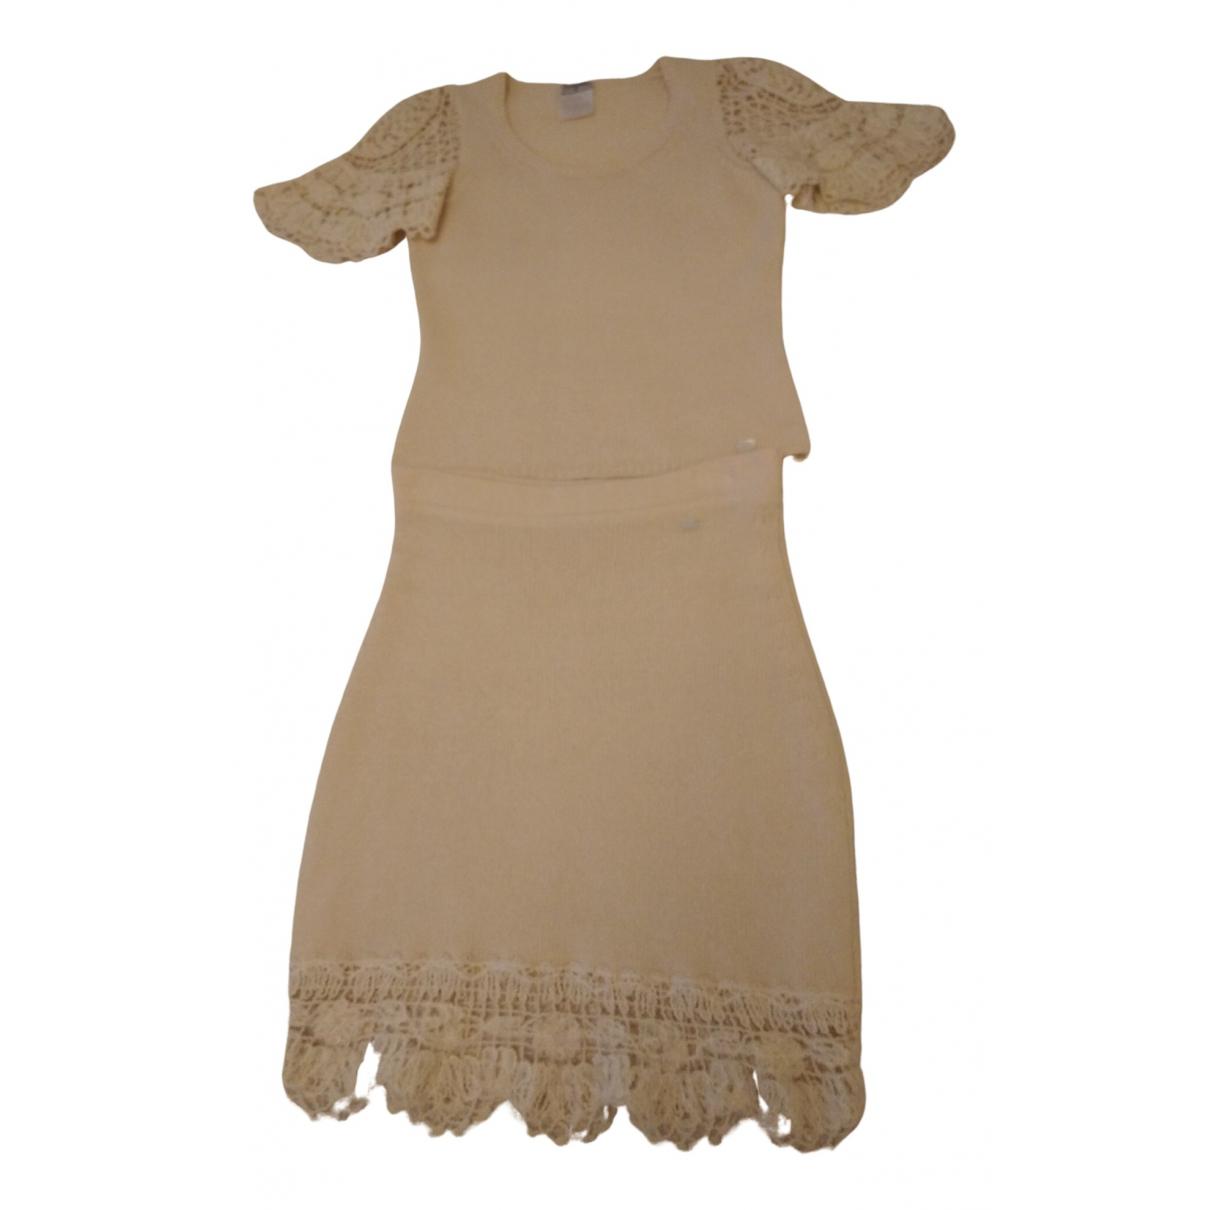 Chanel \N Beige Cashmere dress for Women 34 FR